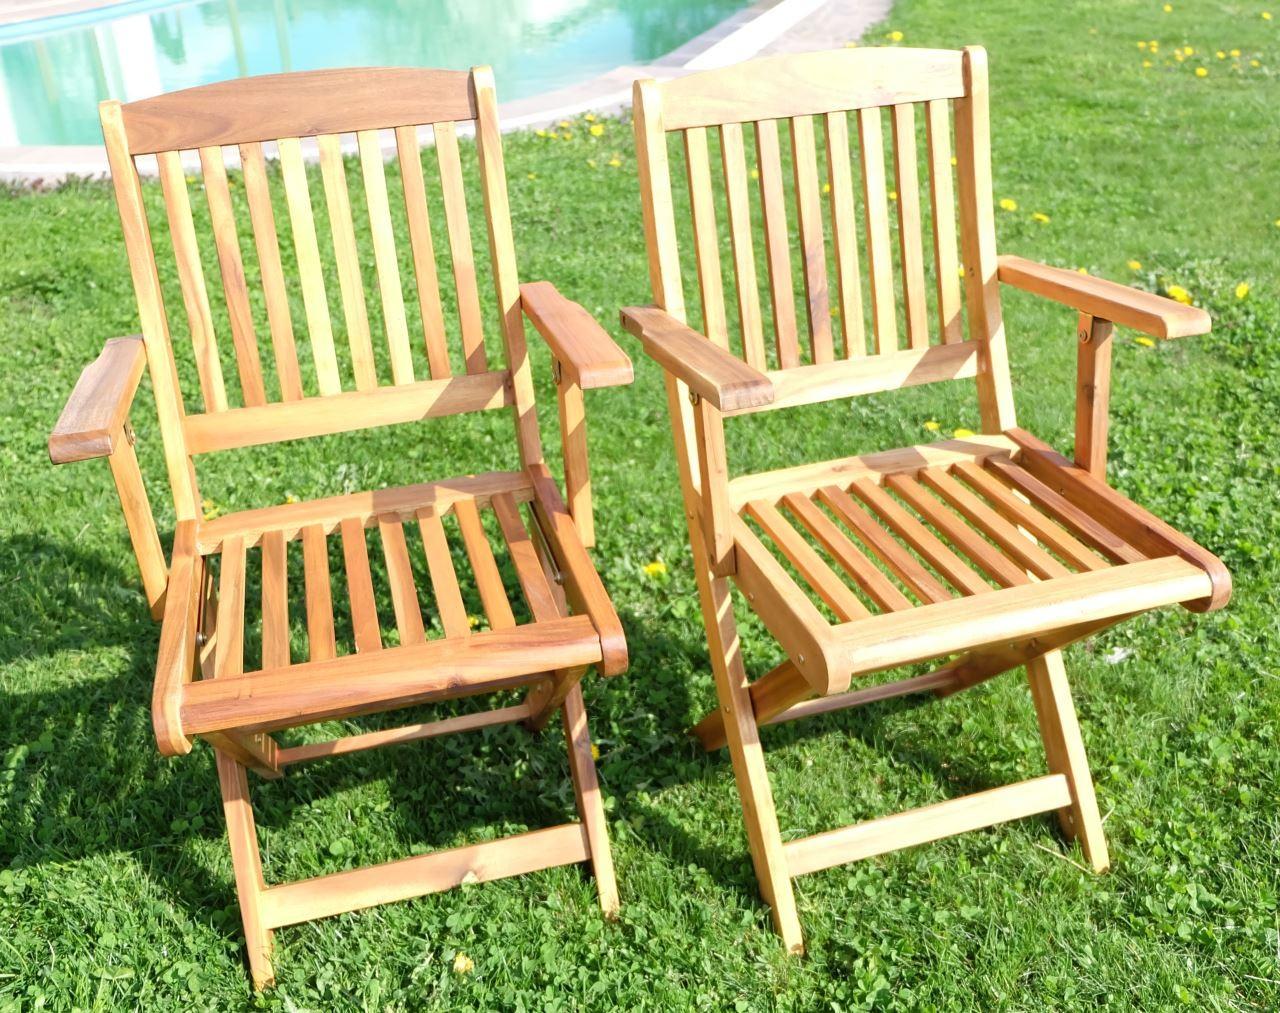 2x gartensessel gartenstuhl sessel holzsessel armlehne holz akazie w teak c4016h ebay. Black Bedroom Furniture Sets. Home Design Ideas